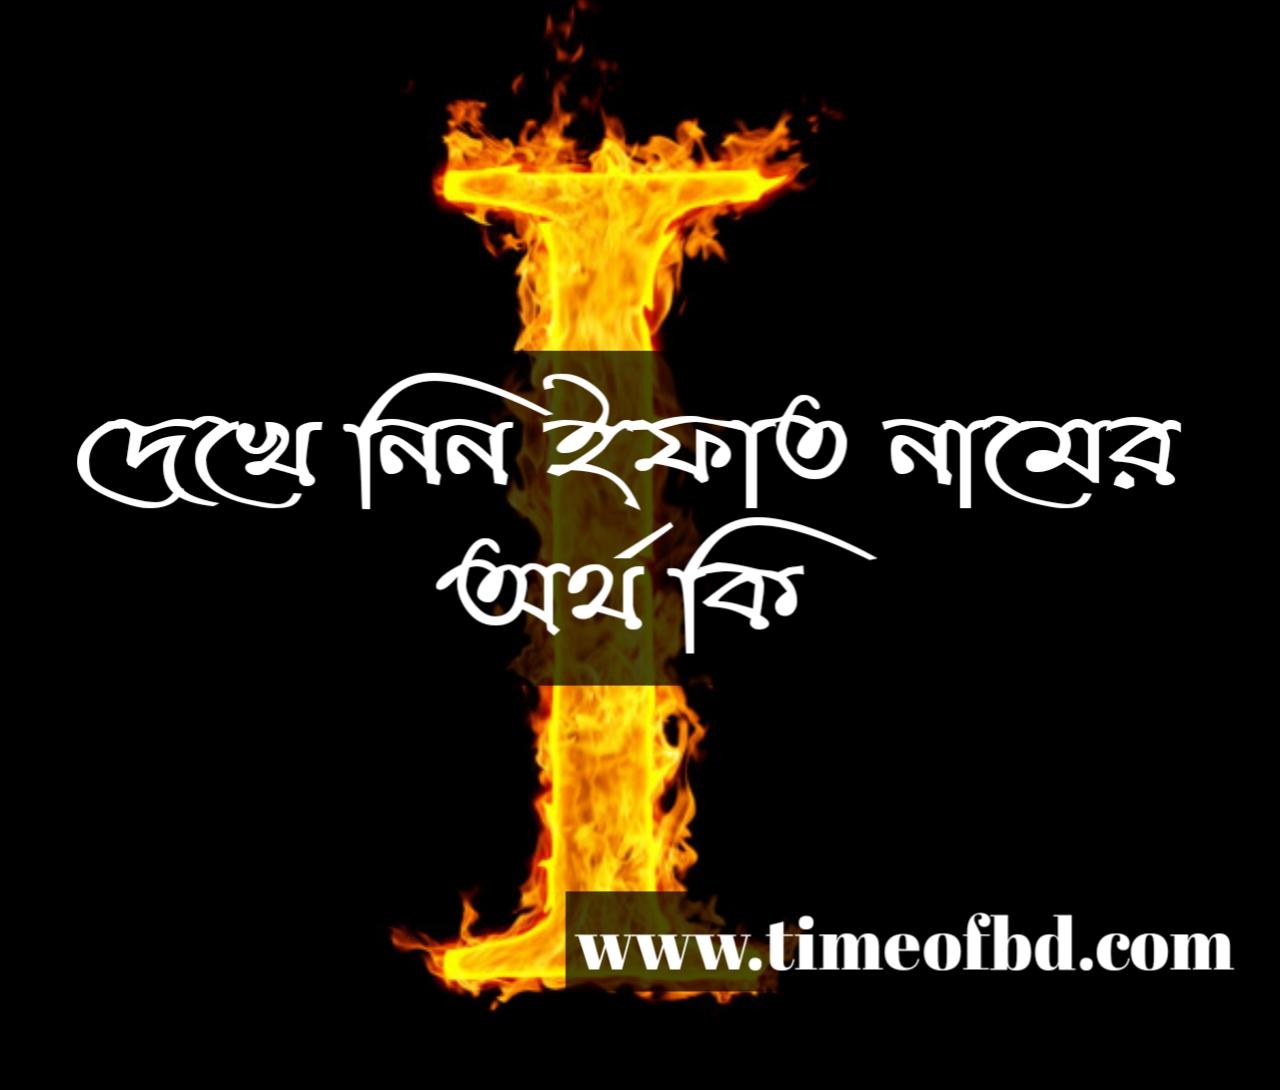 Ifat name meaning in Bengali, ইফাত নামের অর্থ কি, ইফাত নামের বাংলা অর্থ কি, ইফাত নামের ইসলামিক অর্থ কি,